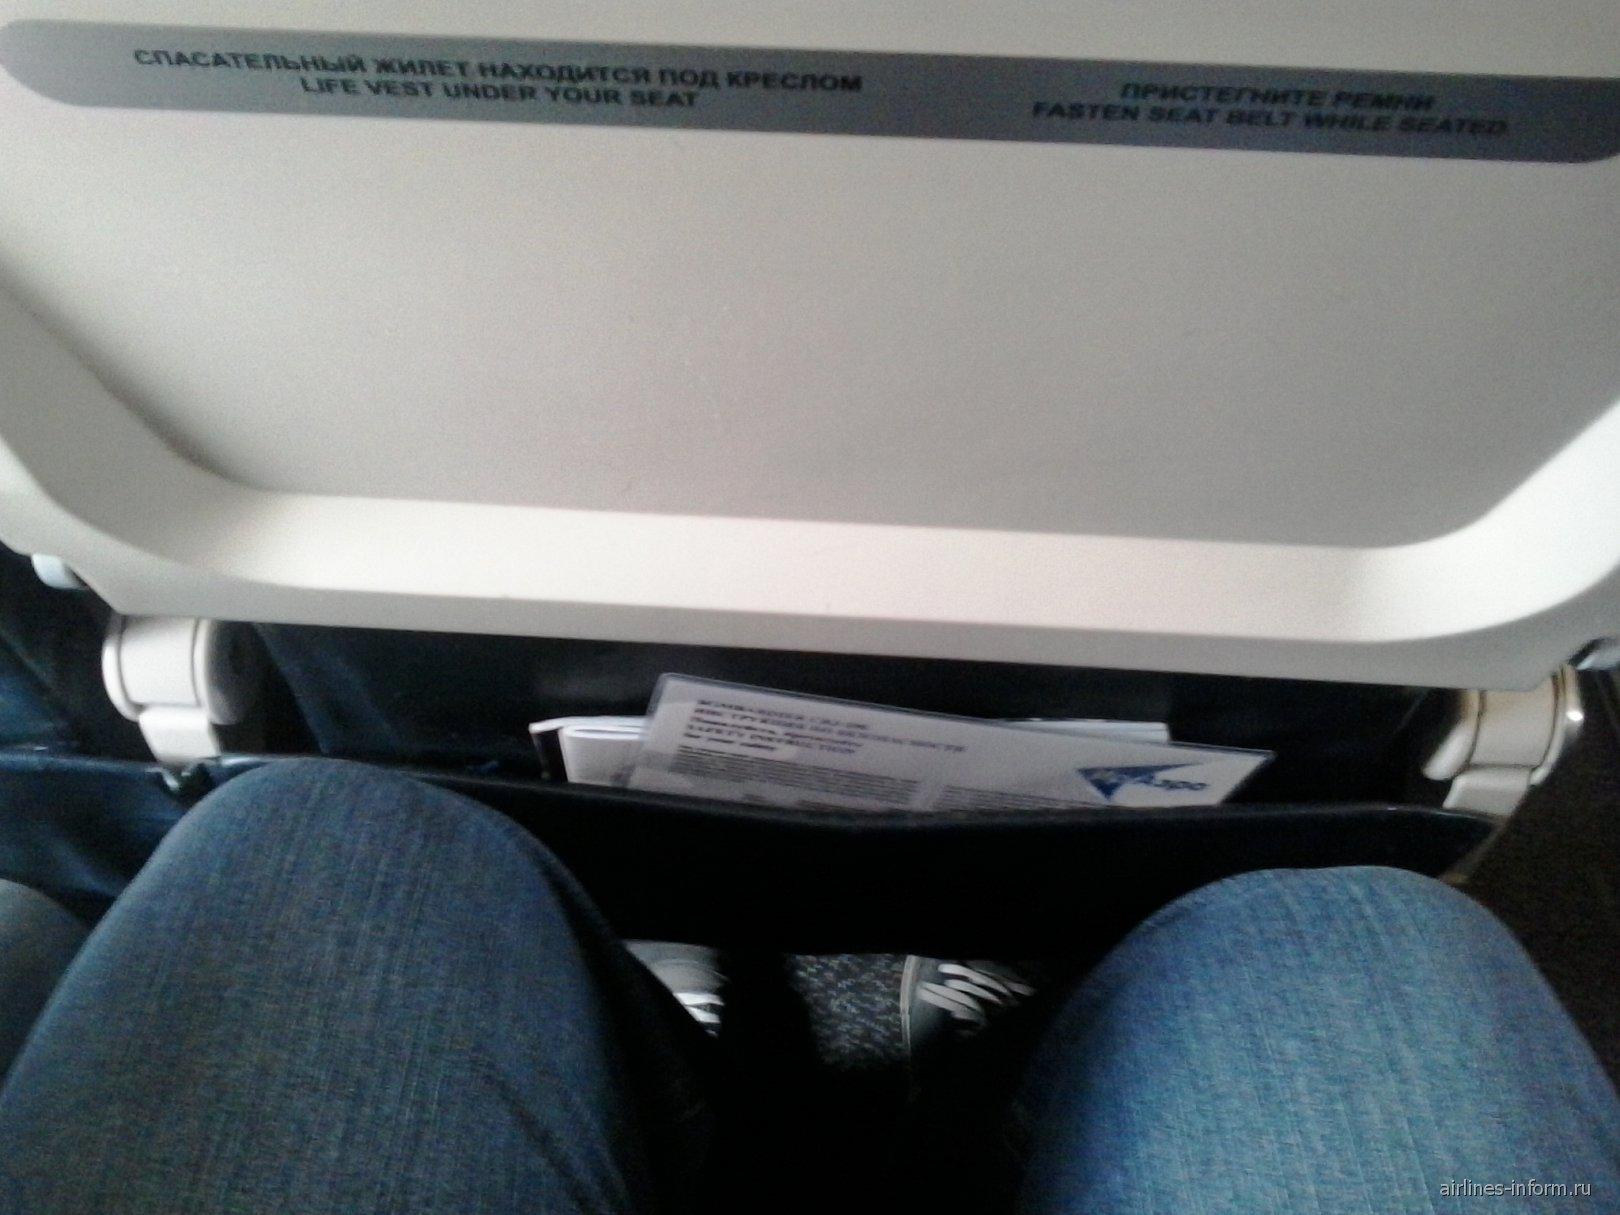 Салон самолета Bombardier CRJ200 авиакомпании ИрАэро